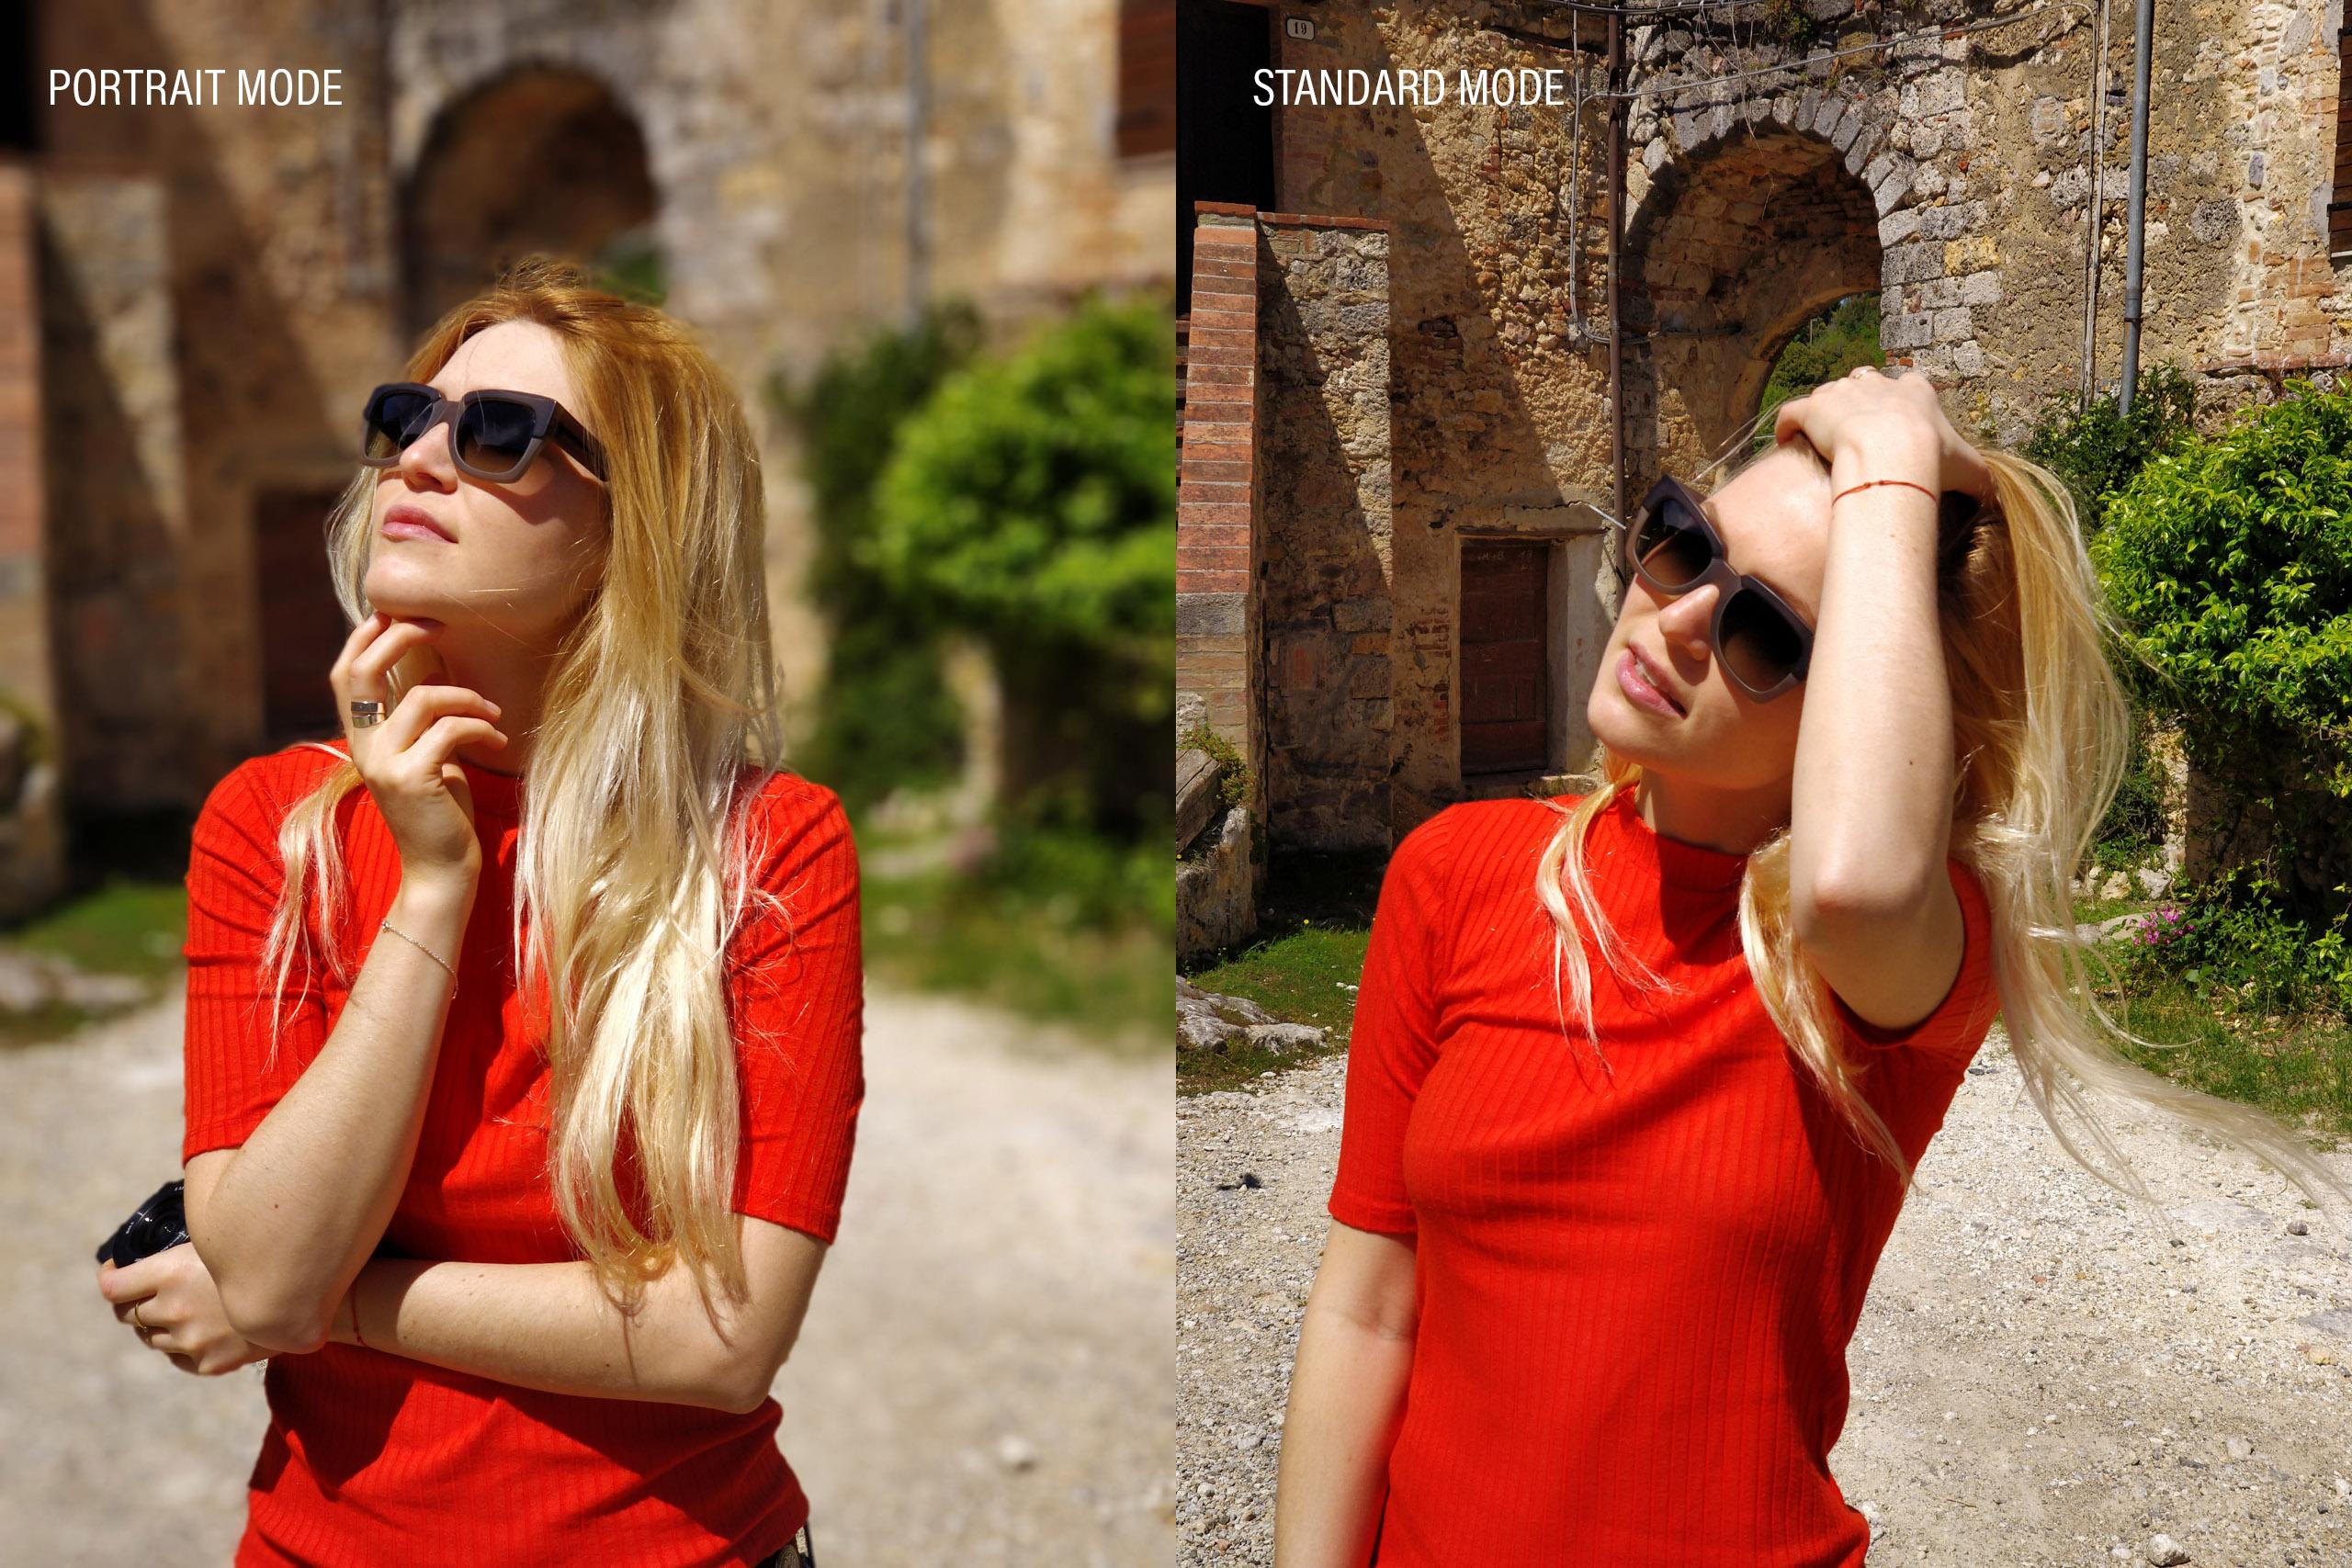 oneplus 5 photo review alessandro michelazzi portrait mode